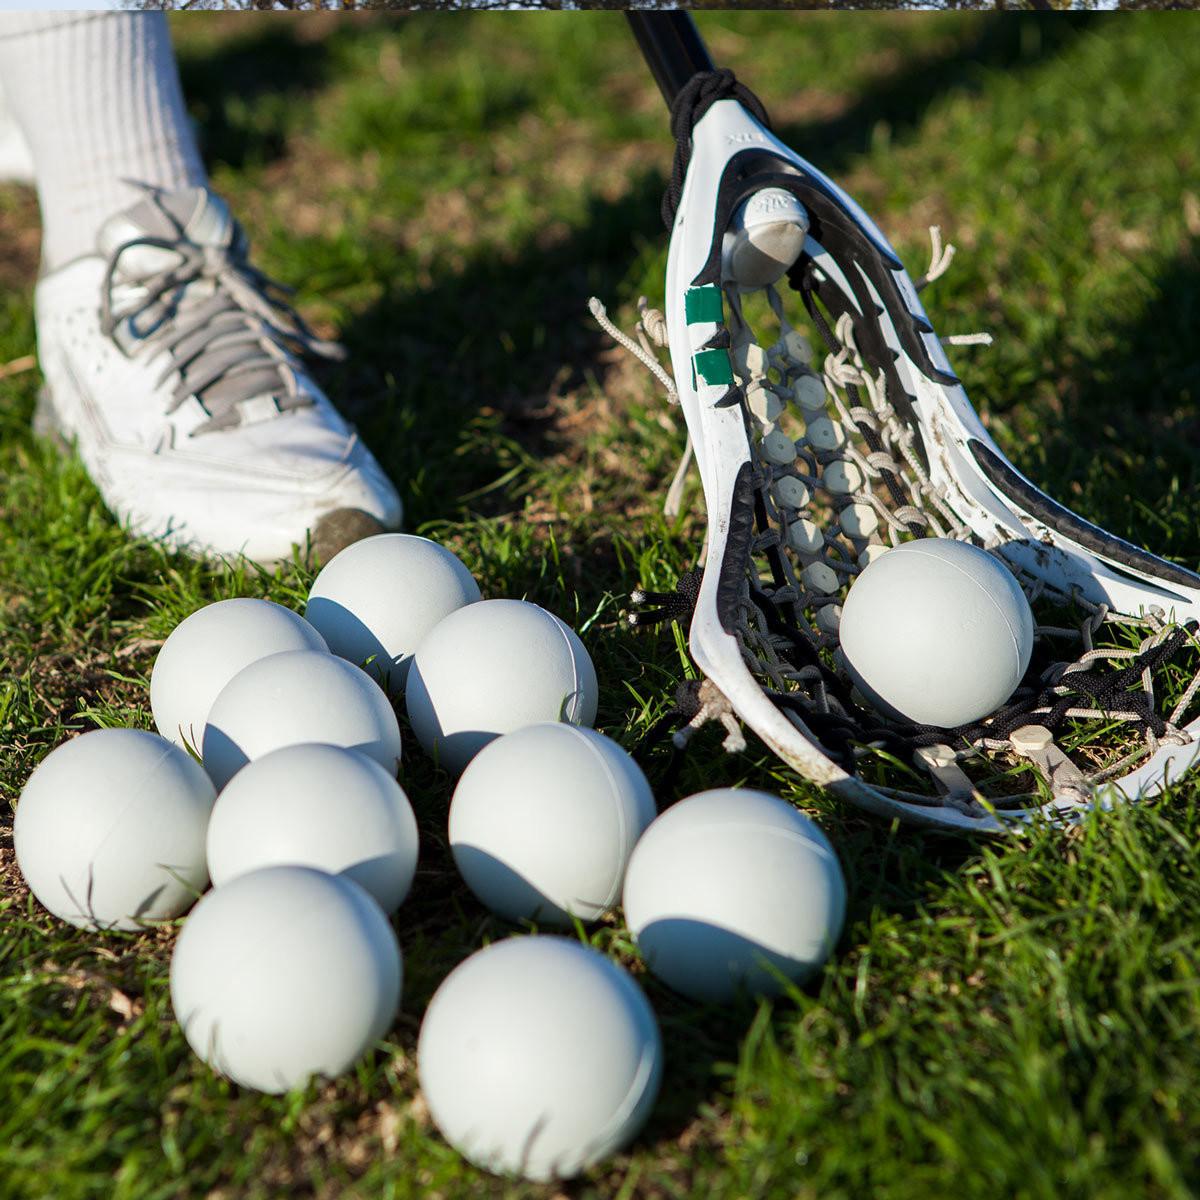 Champion Sports Sponge Practice Lacrosse Balls